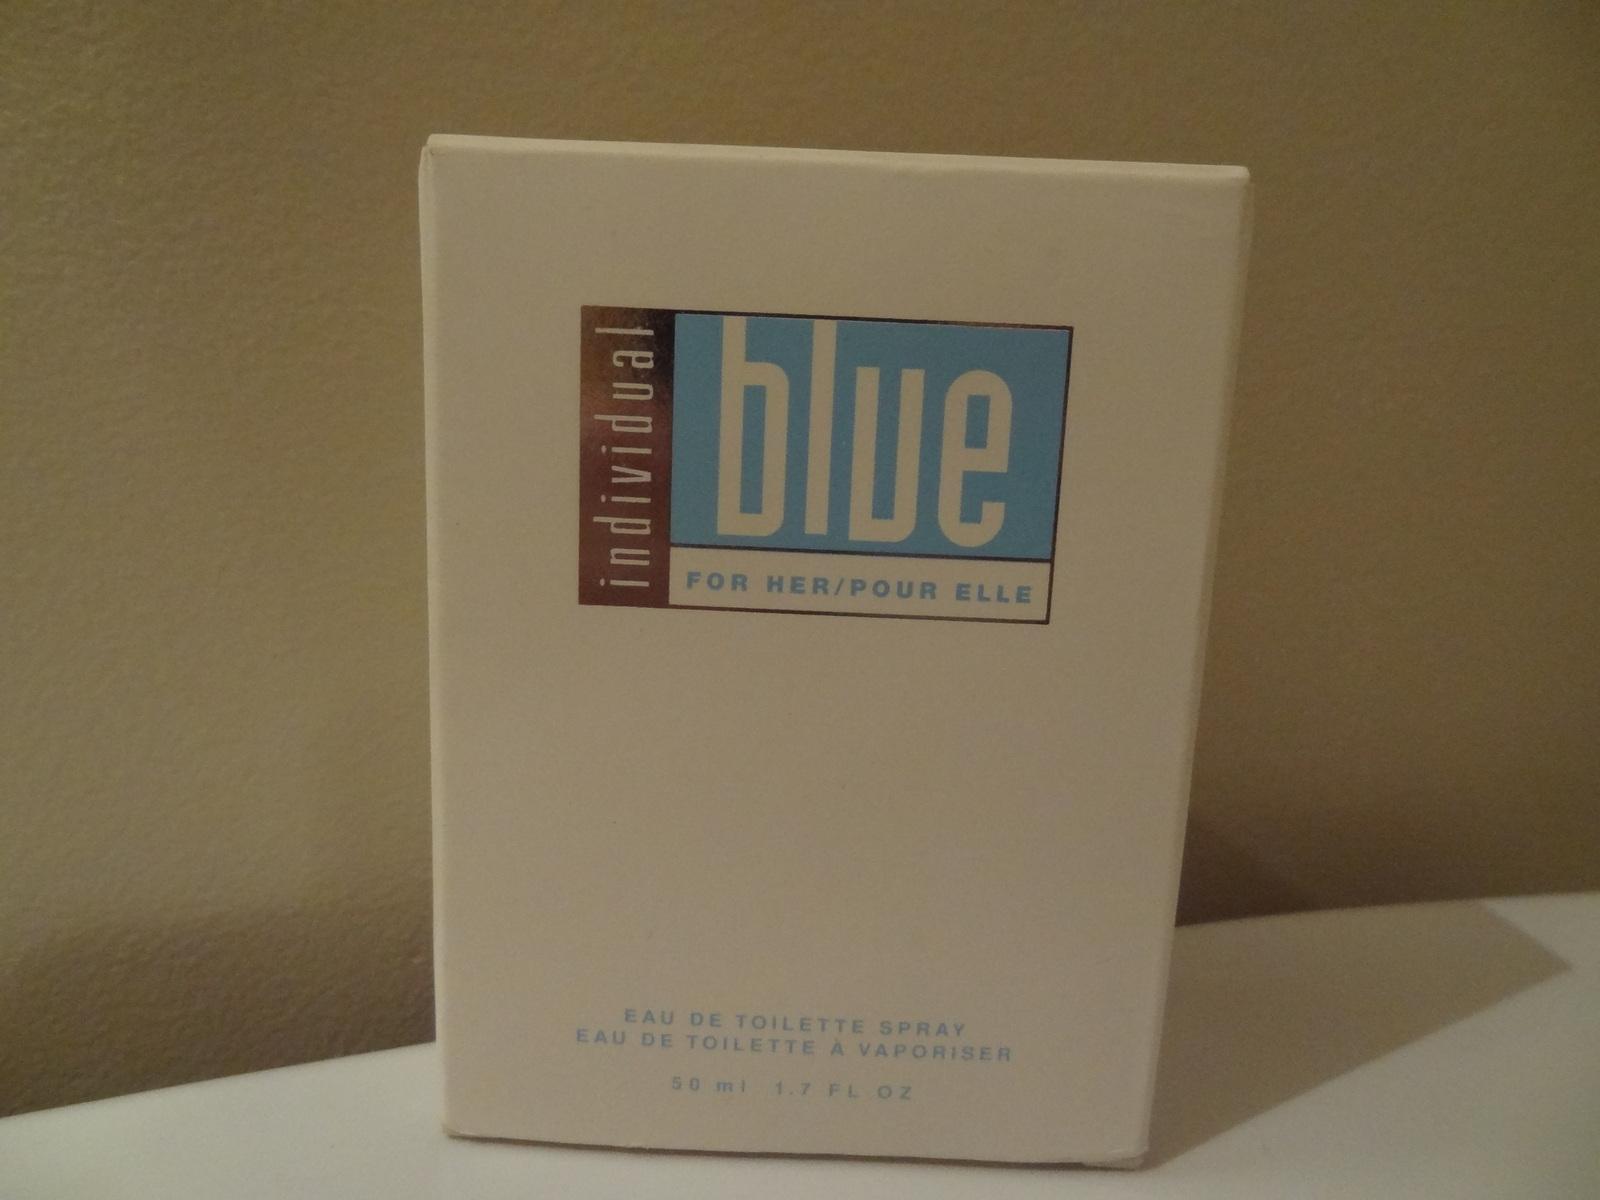 Individual blue for her где купить косметику на кипре